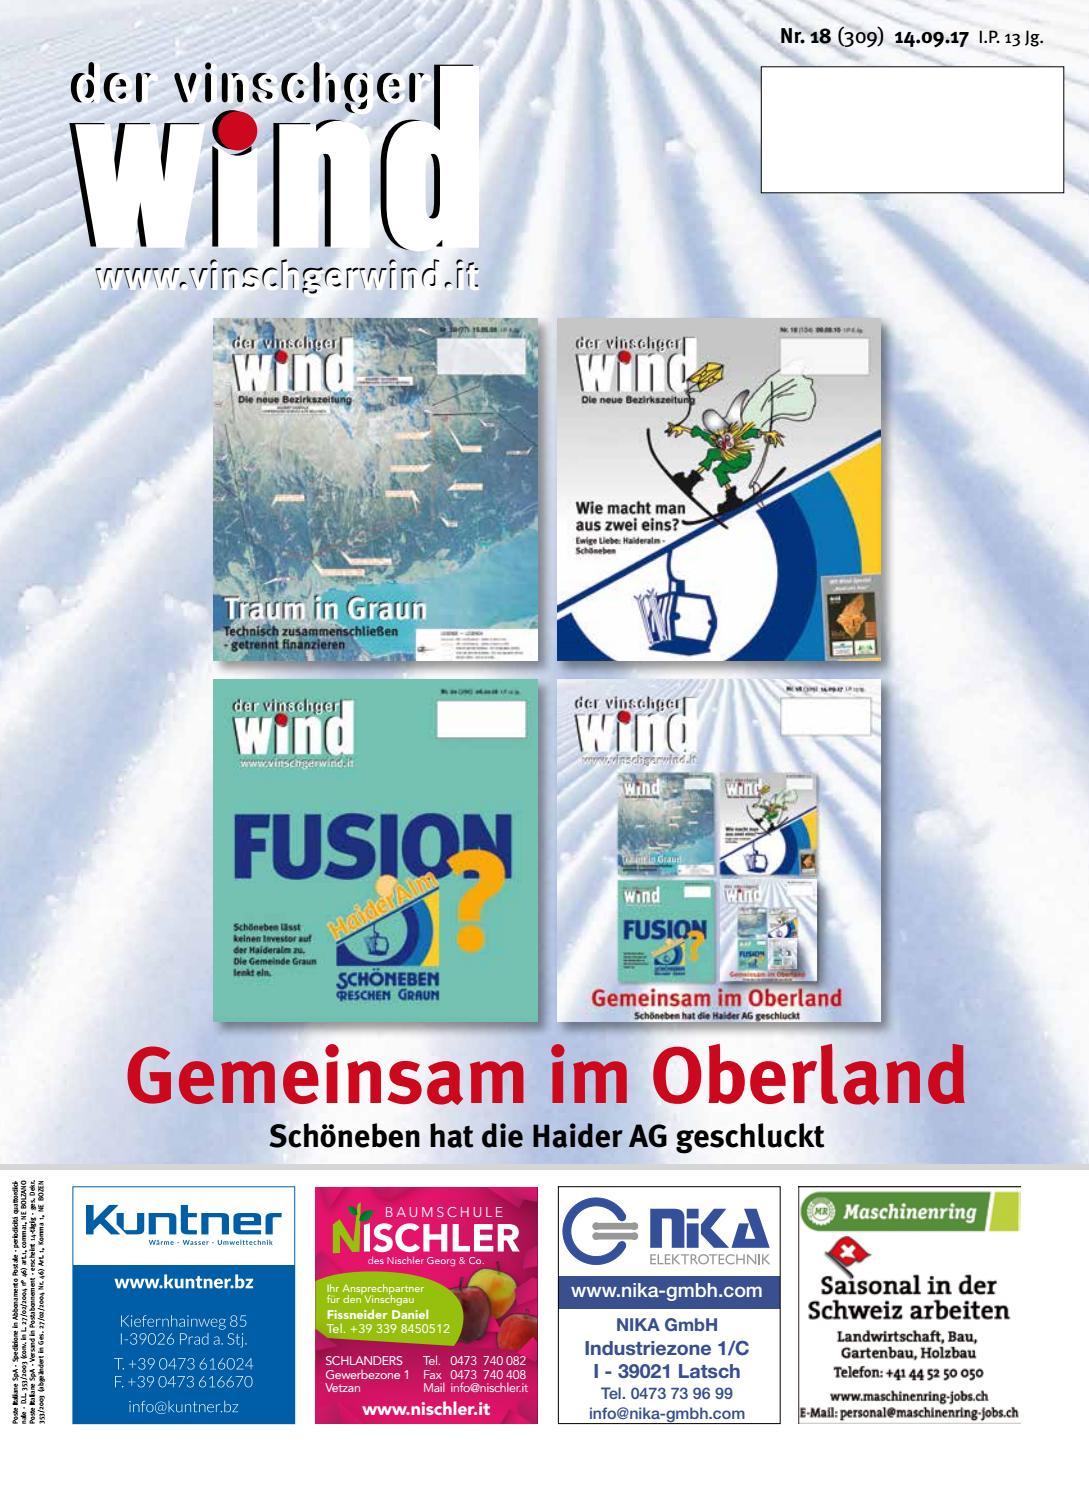 zeitung vinschgerwind ausgabe 18 17 vinschgau s�dtirol by  zeitung vinschgerwind ausgabe 18 17 vinschgau s�dtirol by vinschgerwind issuu